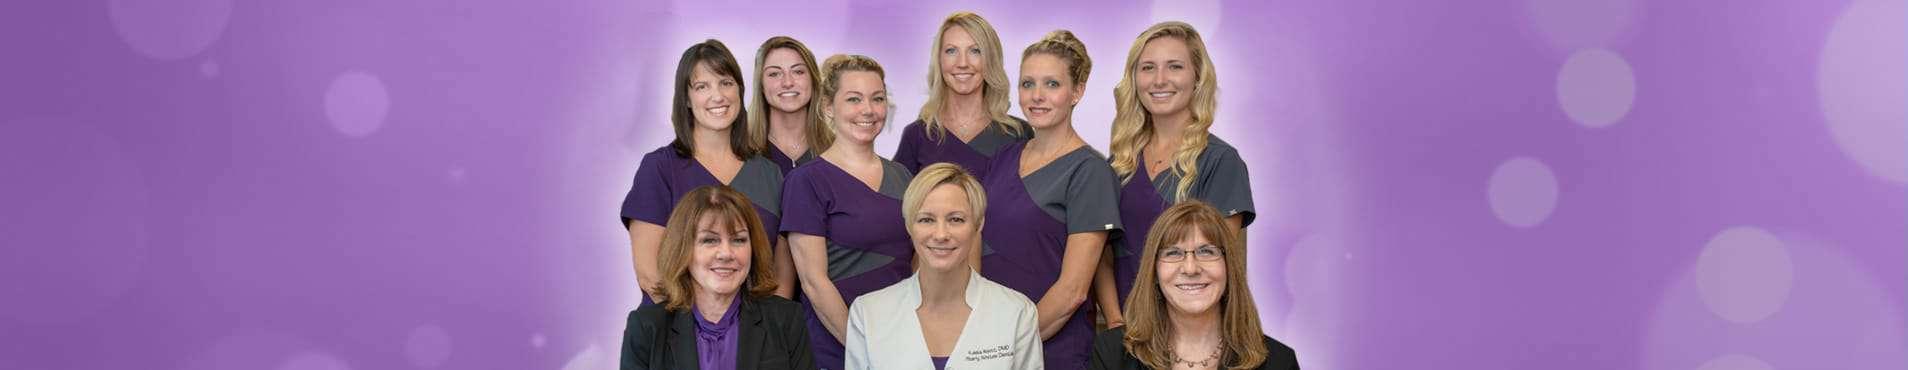 Dental Crowns Dentist Serving Bucks County